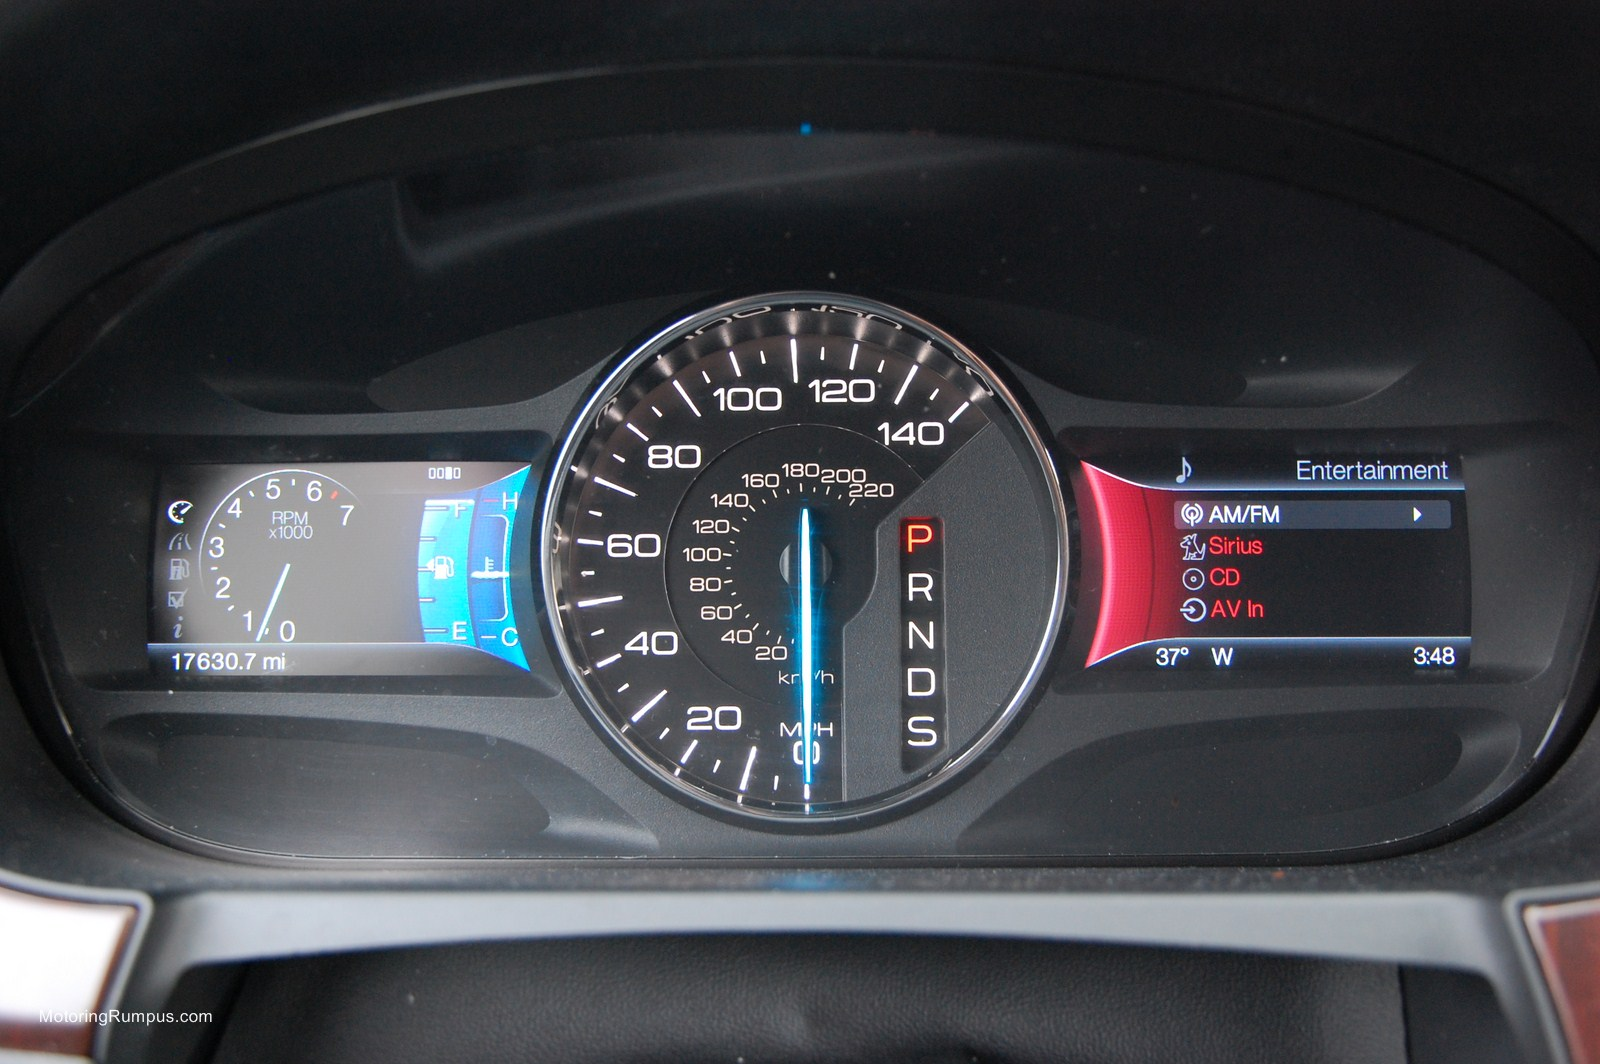 2013 Ford Edge Photo Gallery - Motoring Rumpus